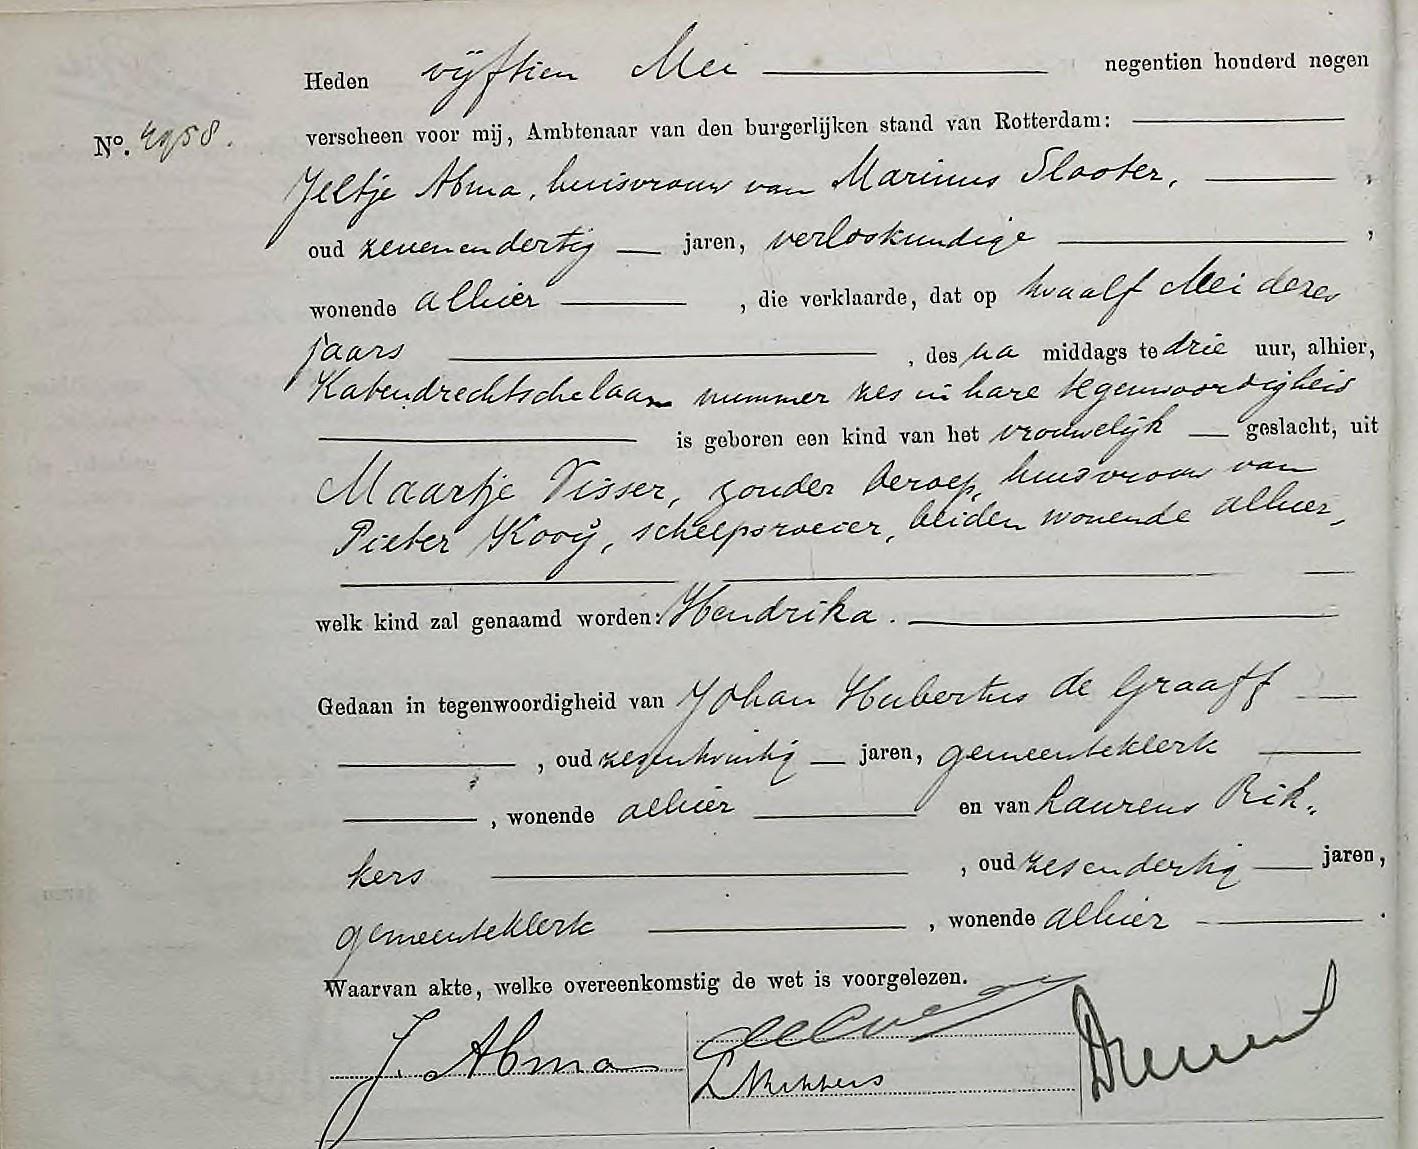 Kooij-Hendrika-geboorteakte-12-05-1909-Rotterdam